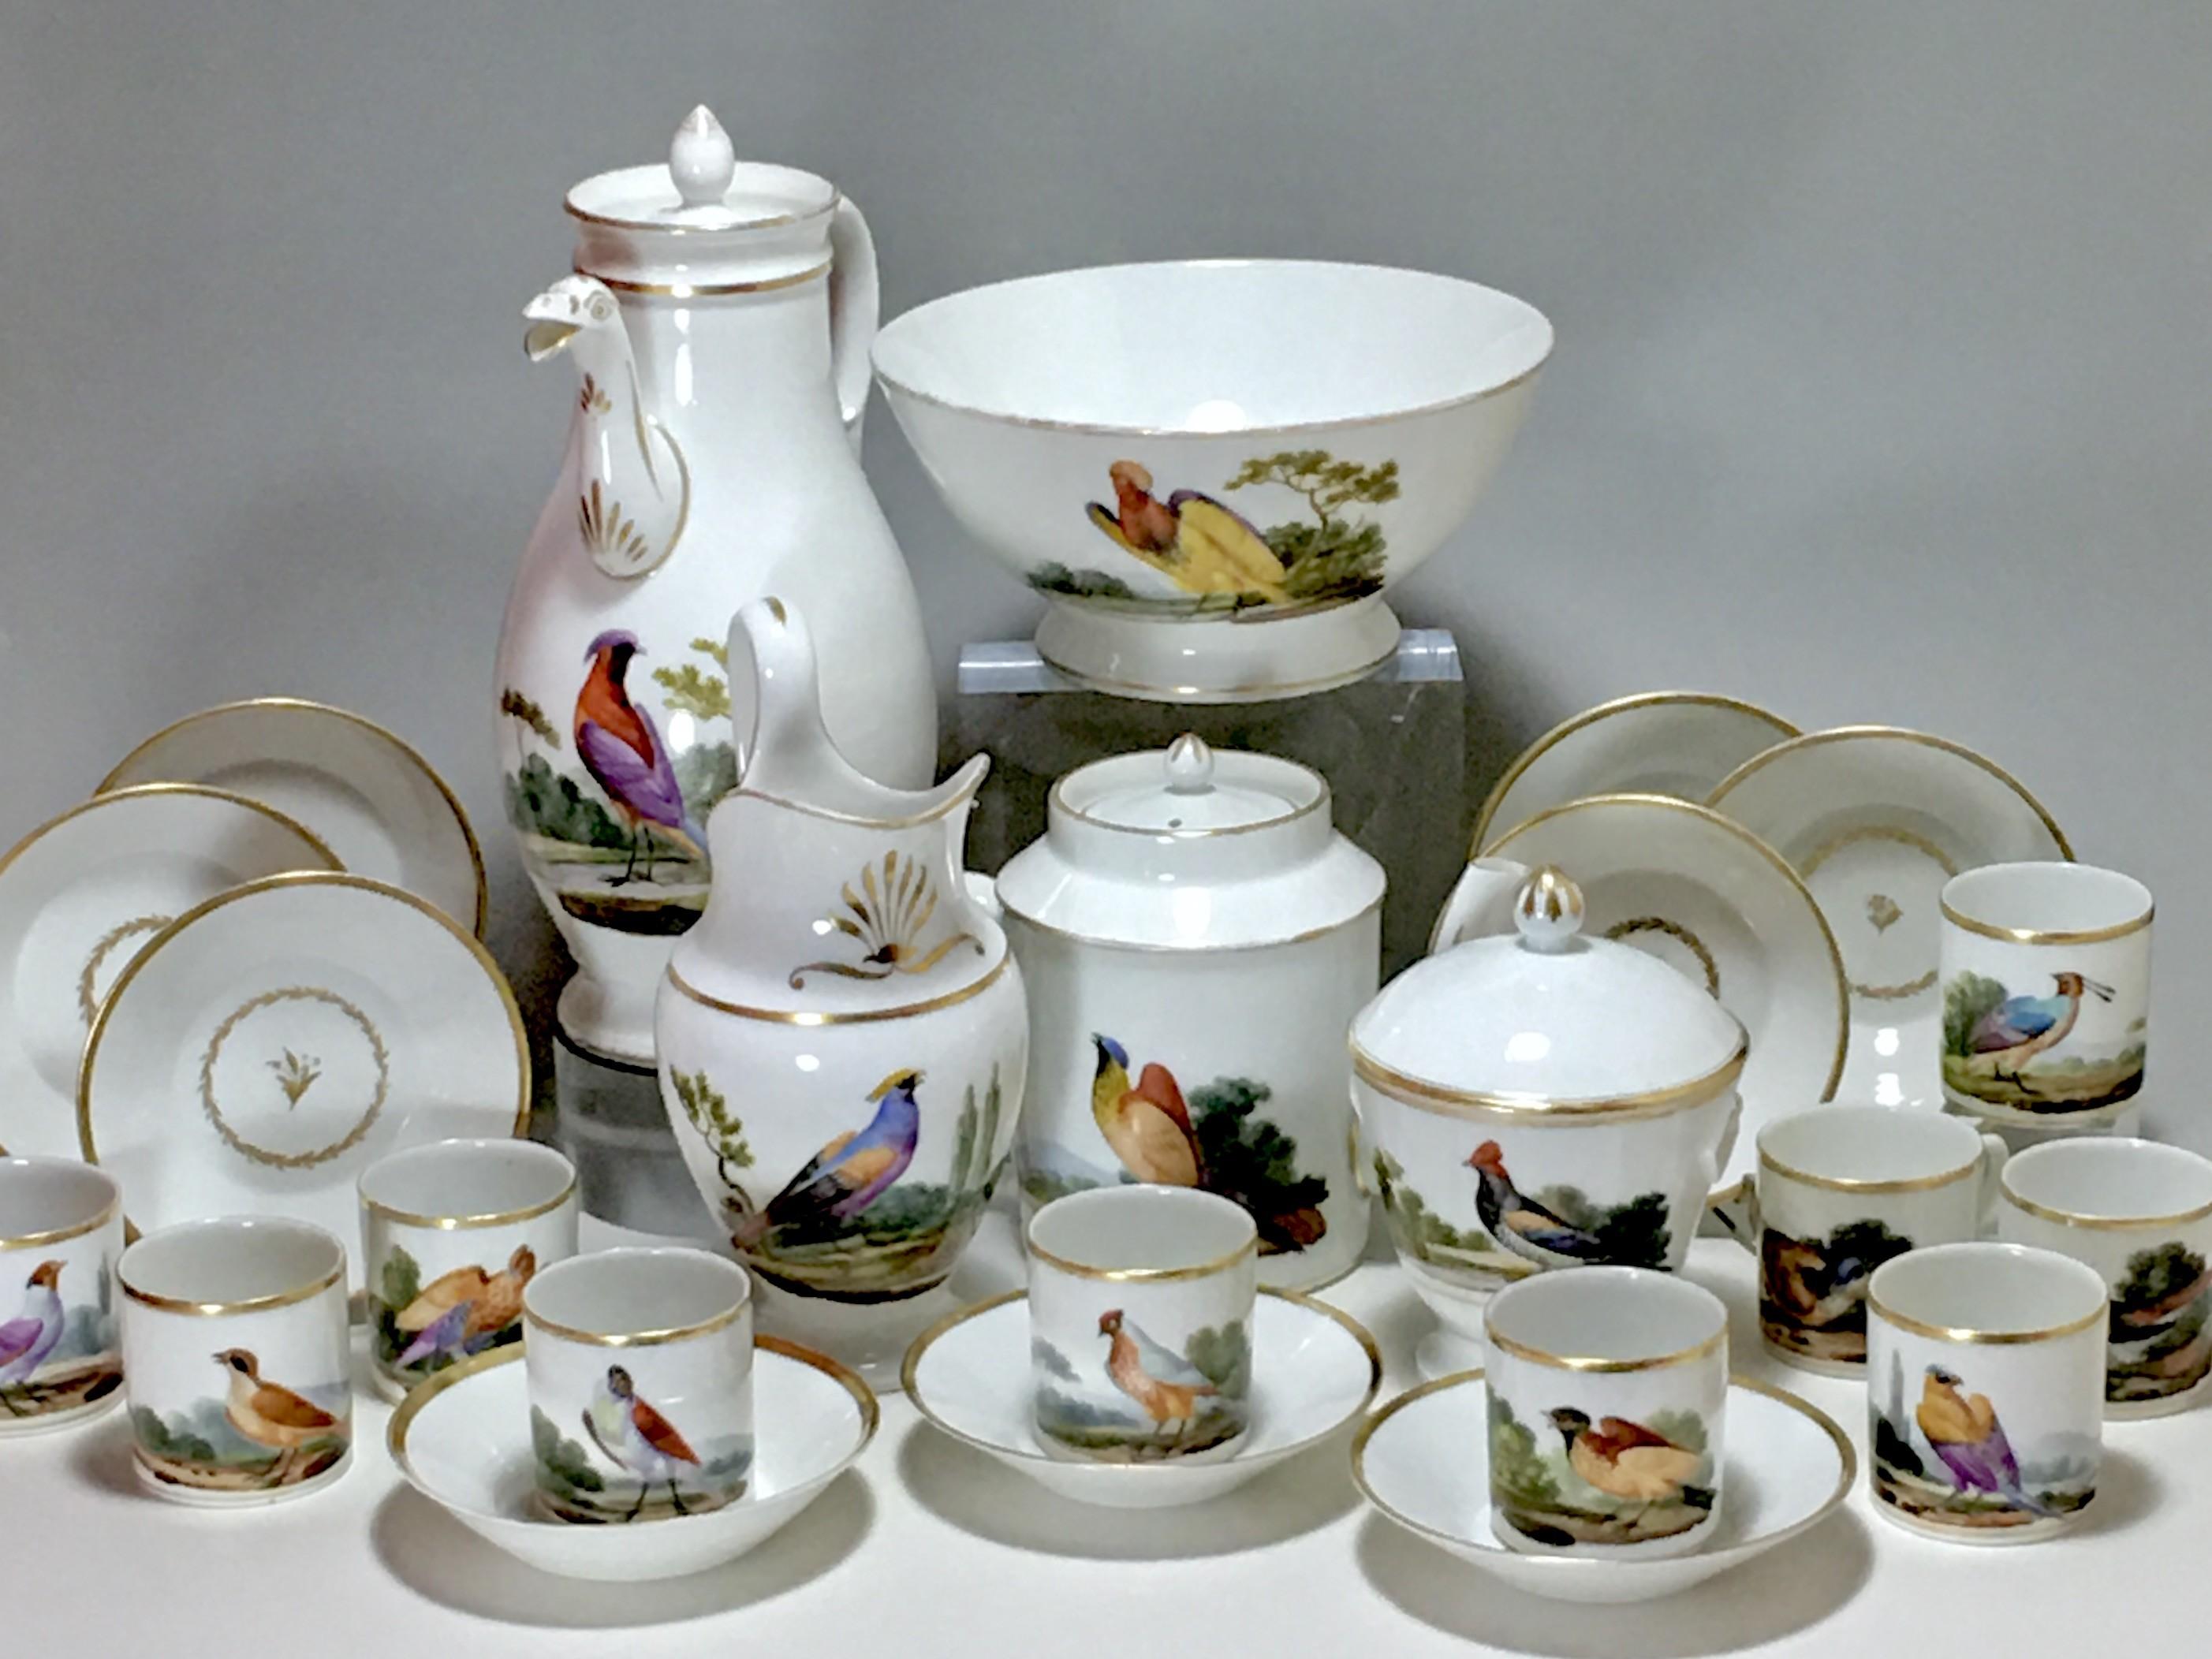 PARIS - TEA AND COFFEE SERVICE WITH BIRDS DECOR - EMPIRE PERIOD